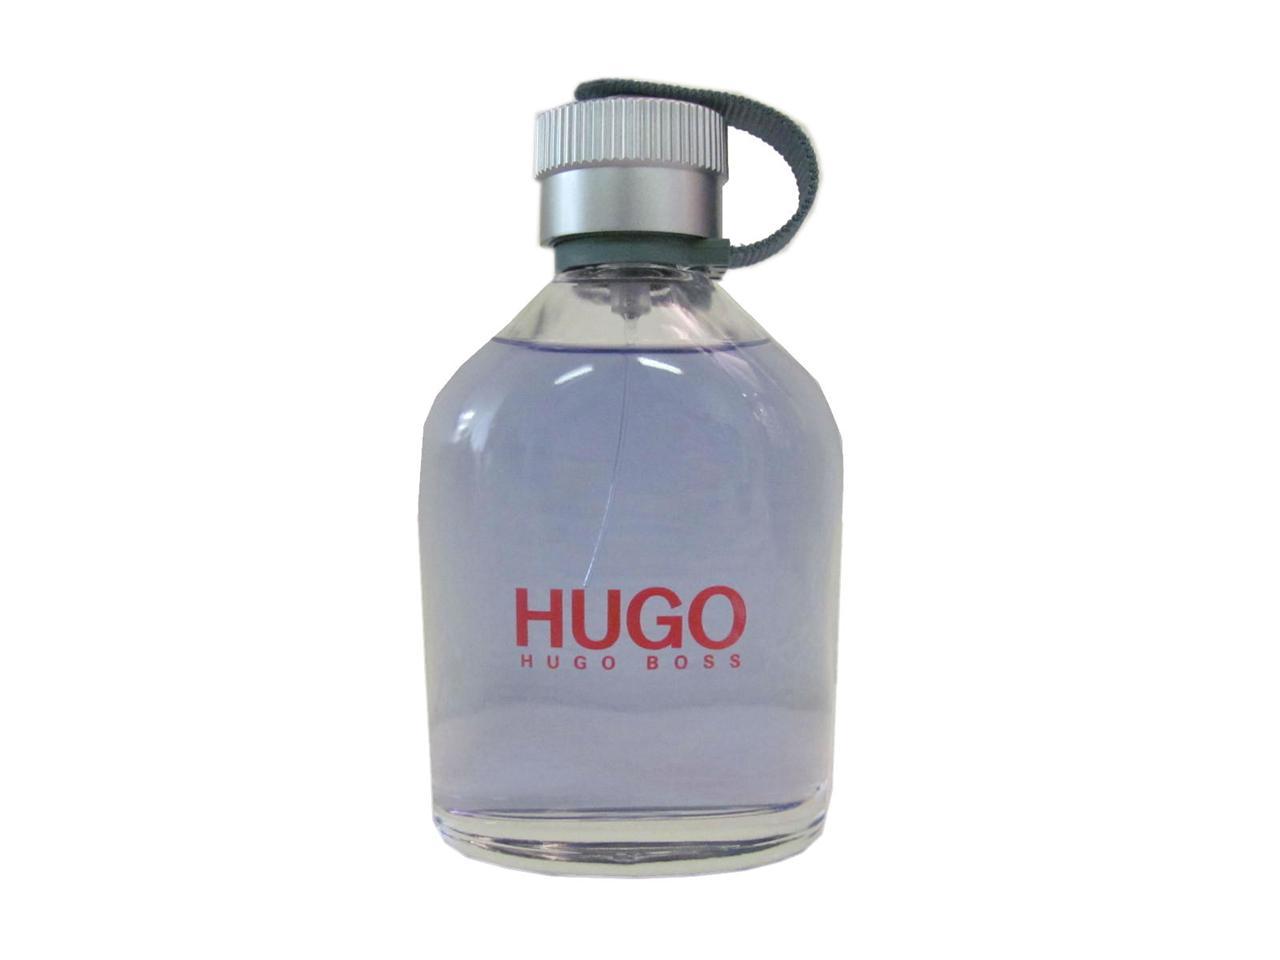 hugo 5 0 oz eau de toilette spray unboxed for by hugo ebay